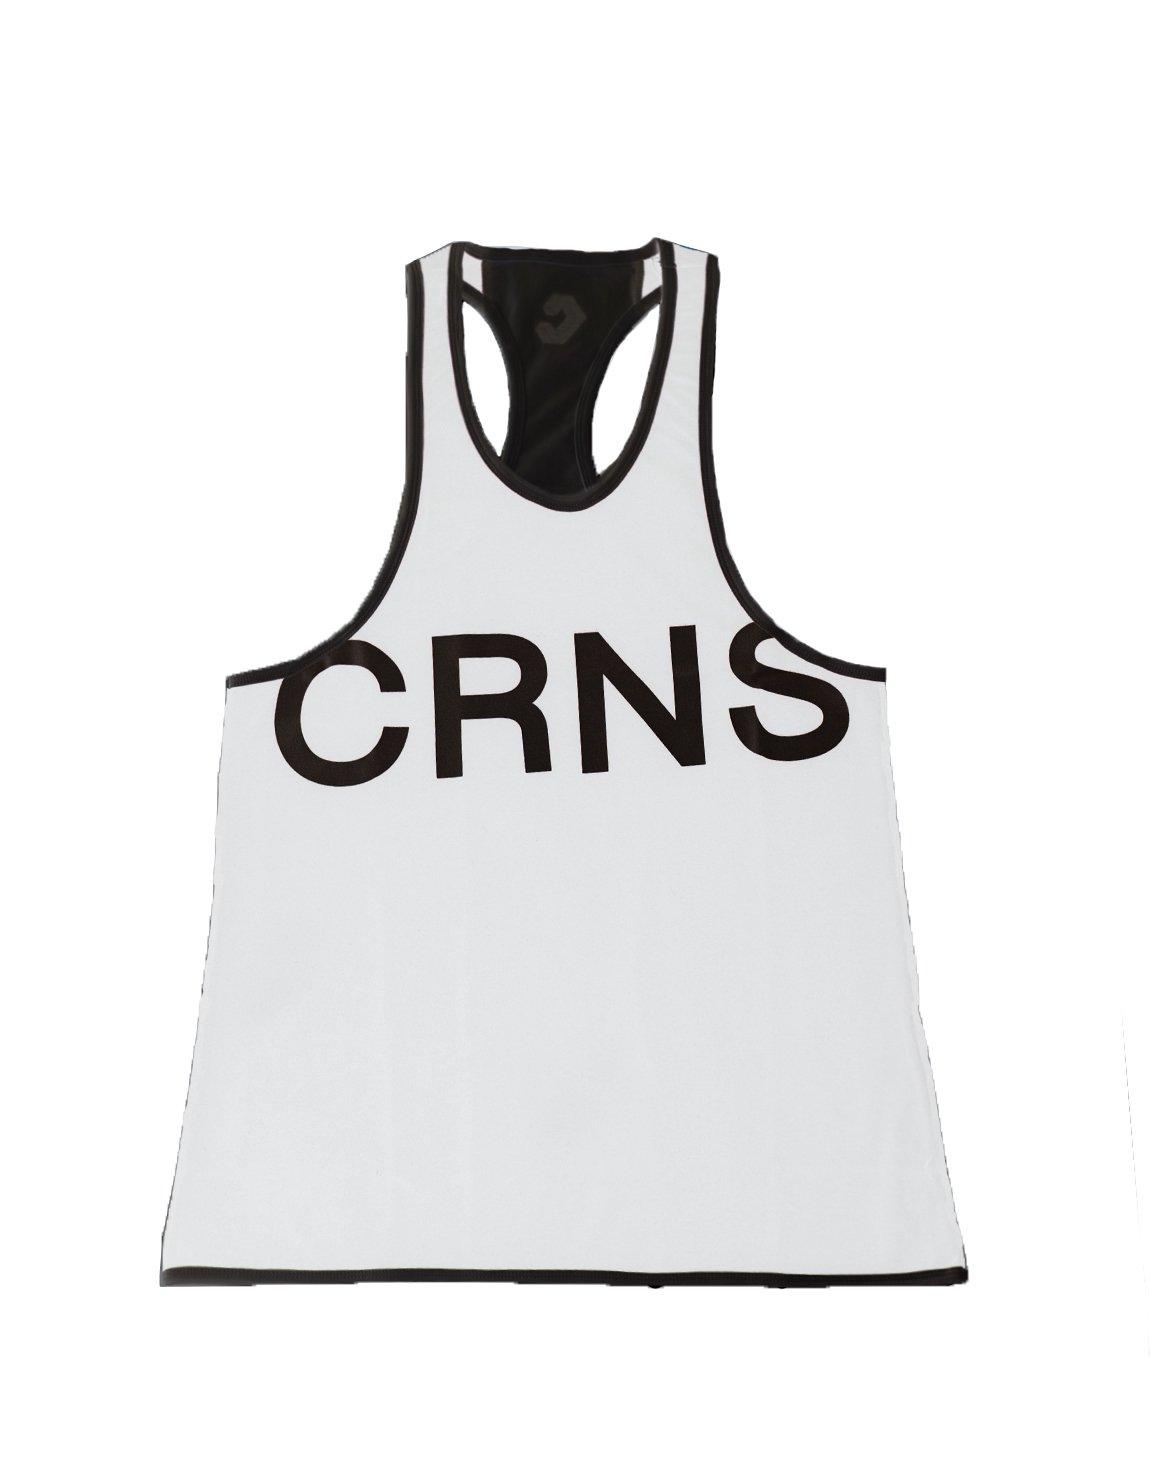 CRNS NEW BIG FONT LOGO TANK TOP 【WHITE】